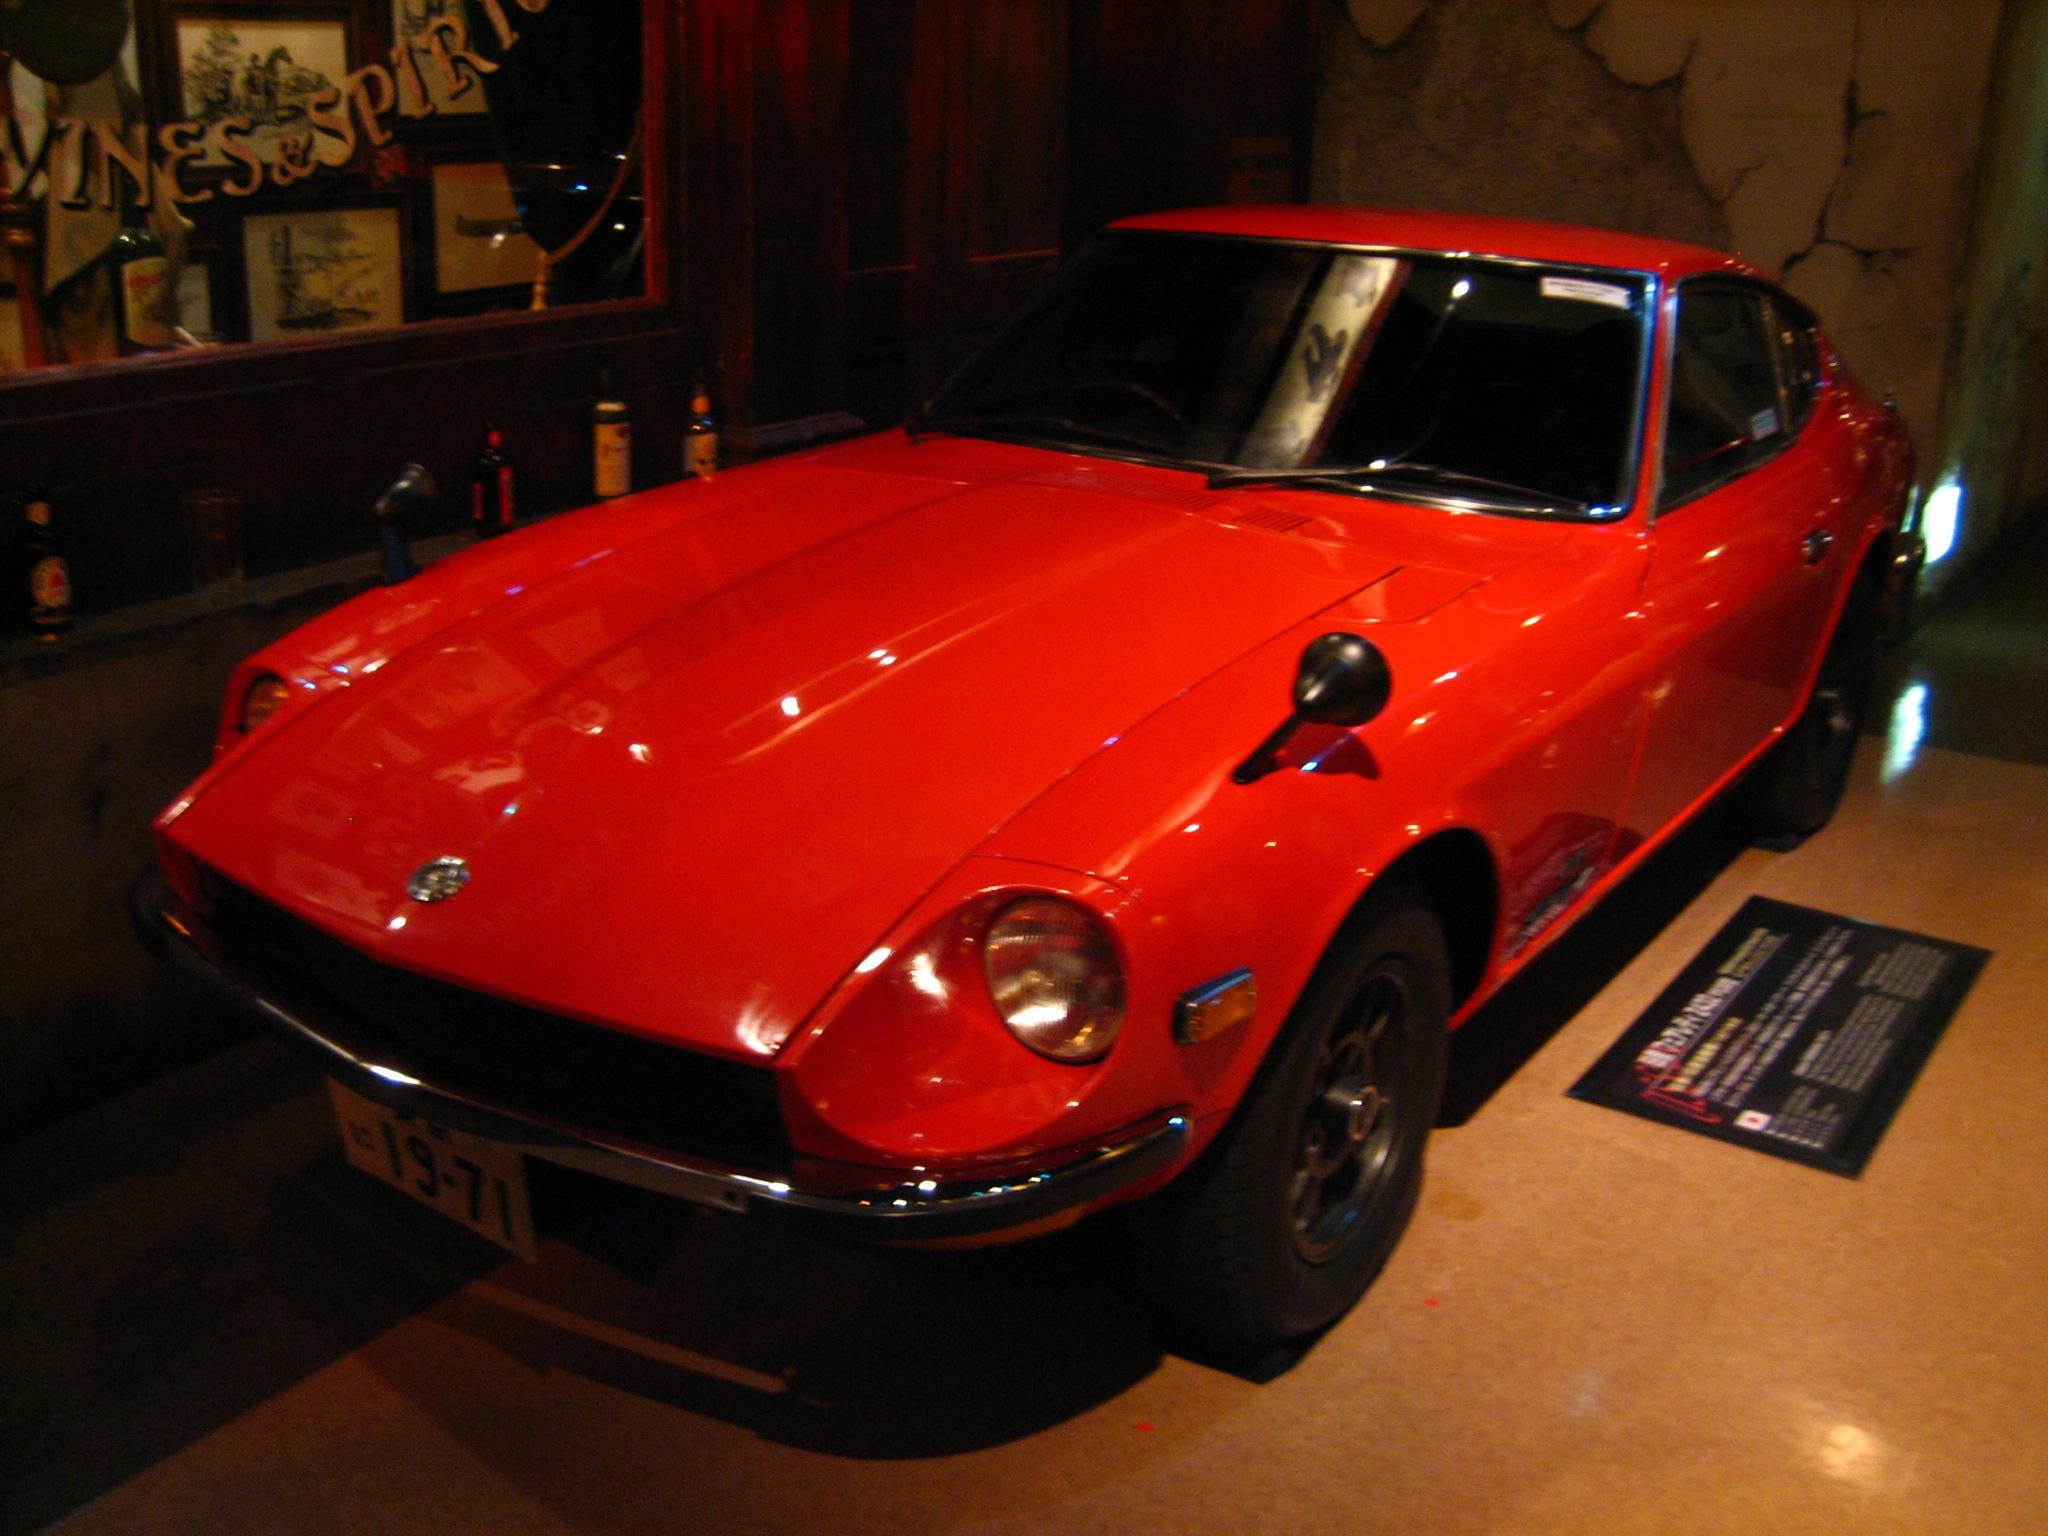 Nissan Fairlady Z >> File:1971 Nissan Fairlady Z 432 PS30, Megaweb History ...